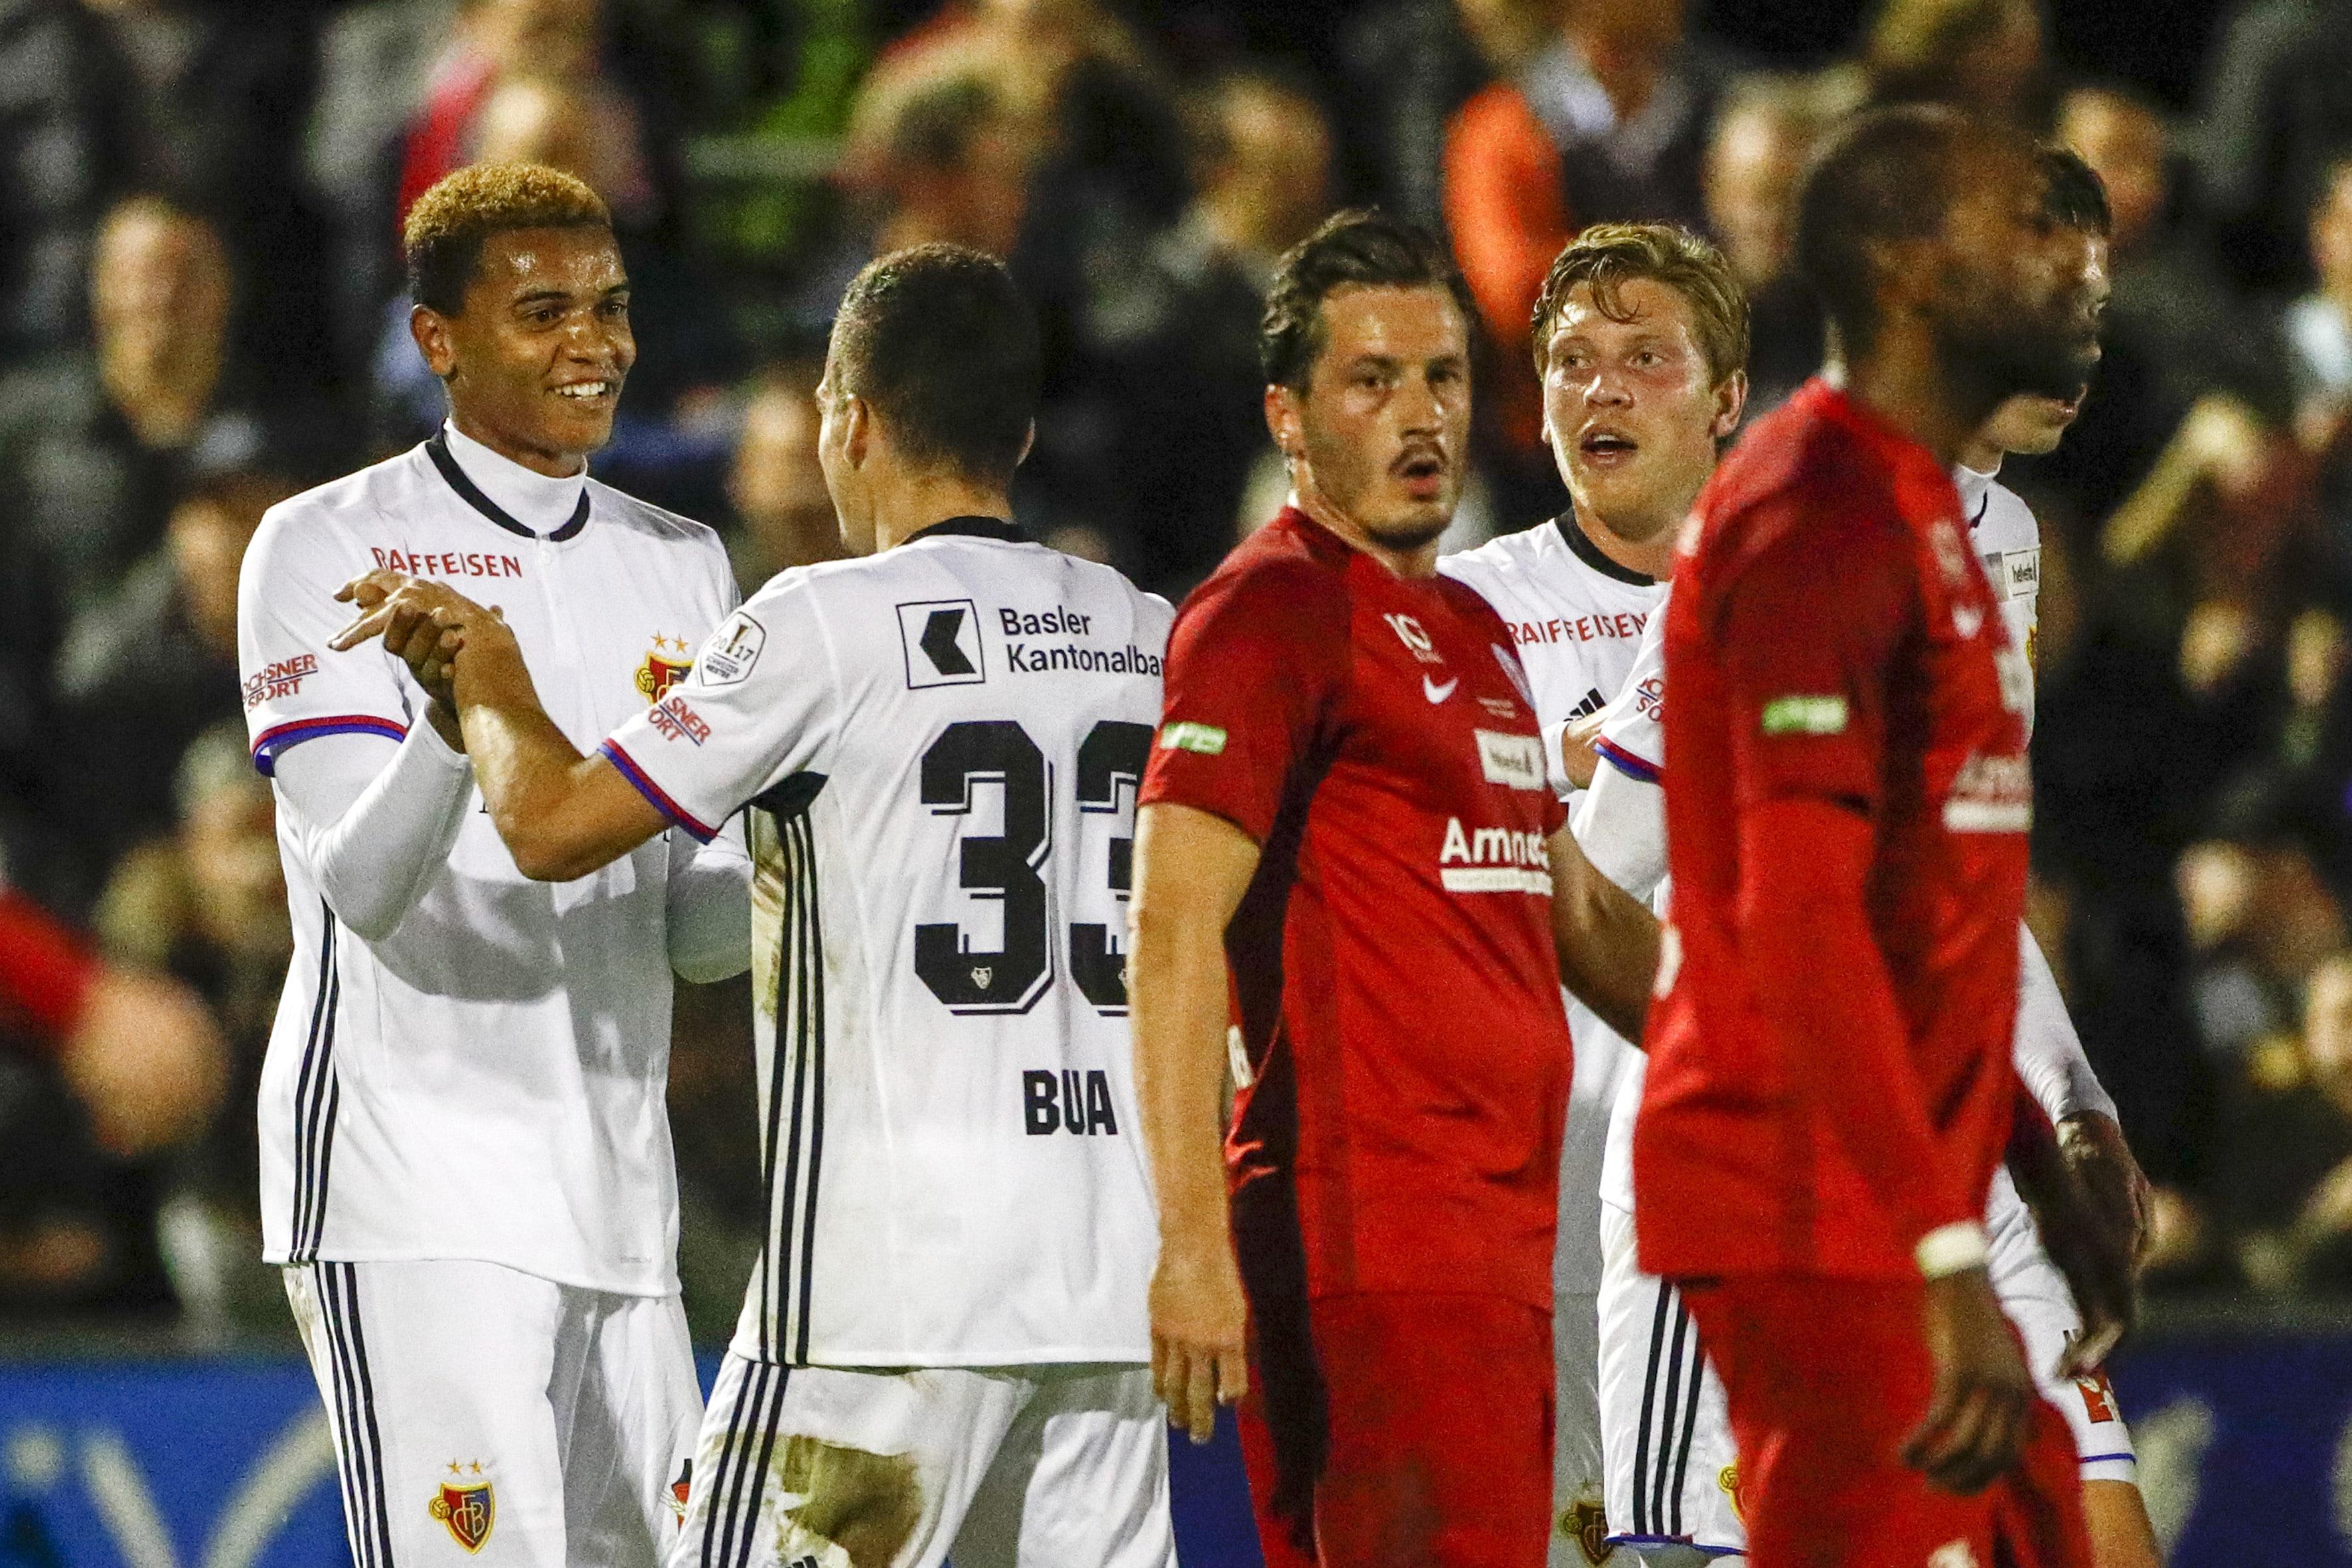 25.10.2017; Rapperswil; Fussball Schweizer Cup - FC Rapperswil-Jona - FC Basel; Jubel beim Torschuetzen zum 1:1 Manuel Akanj